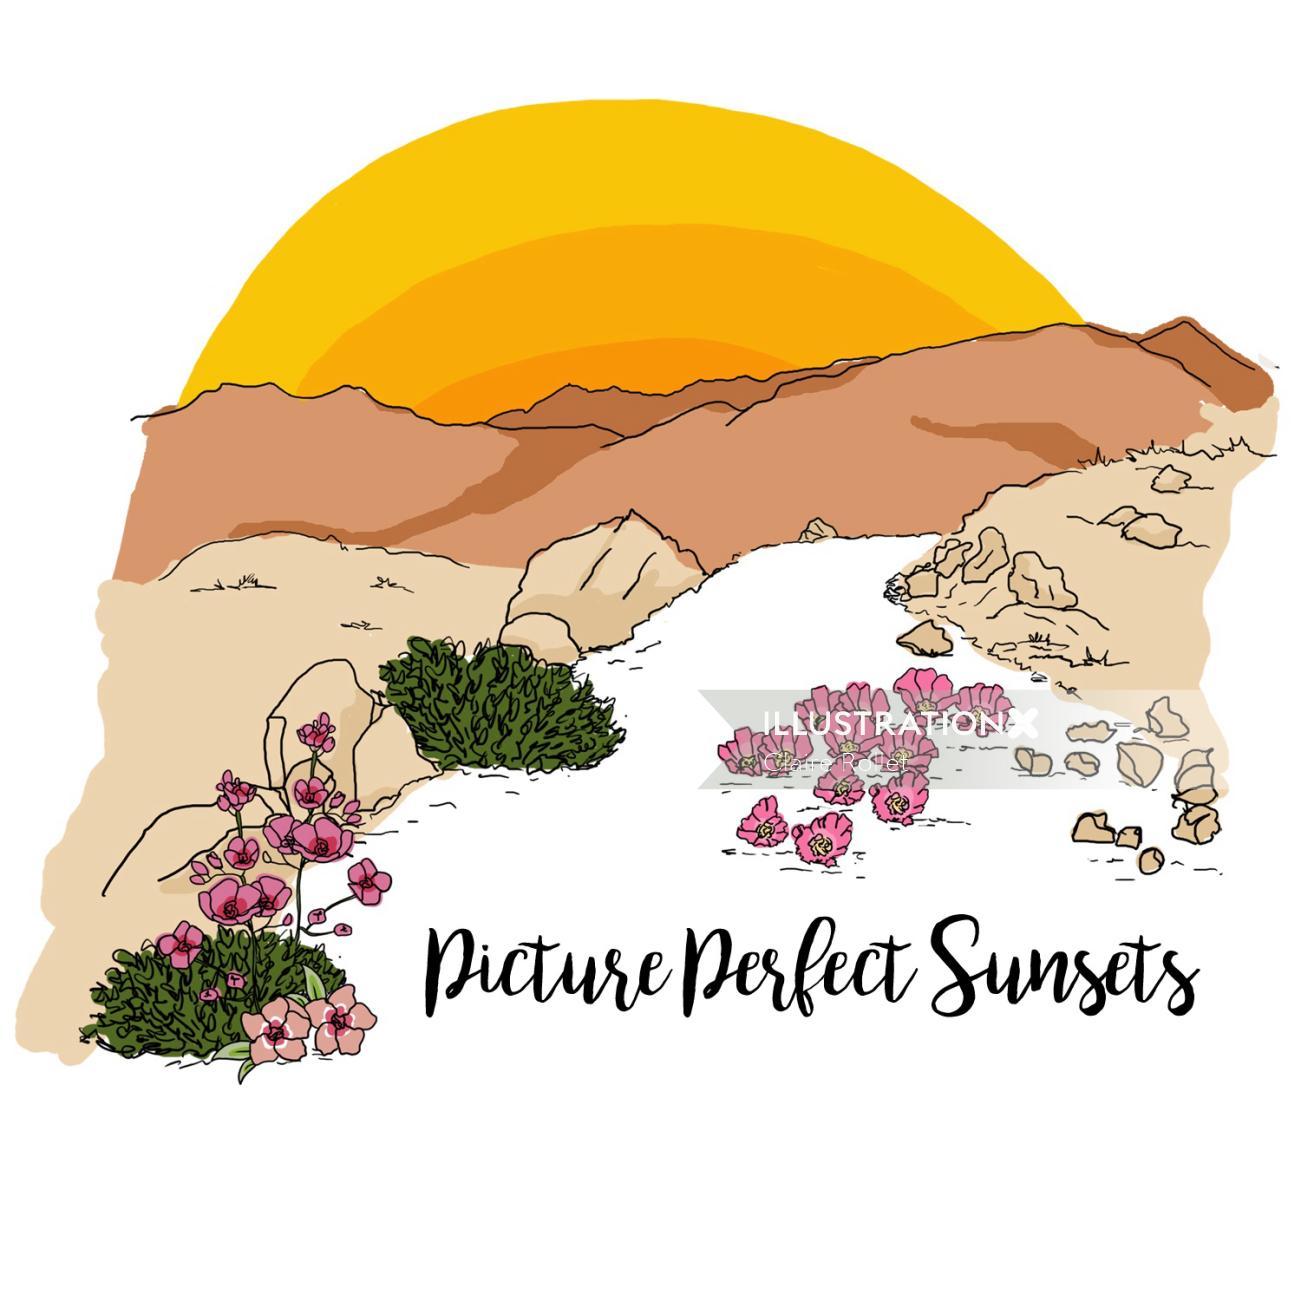 Sunset landscape drawing